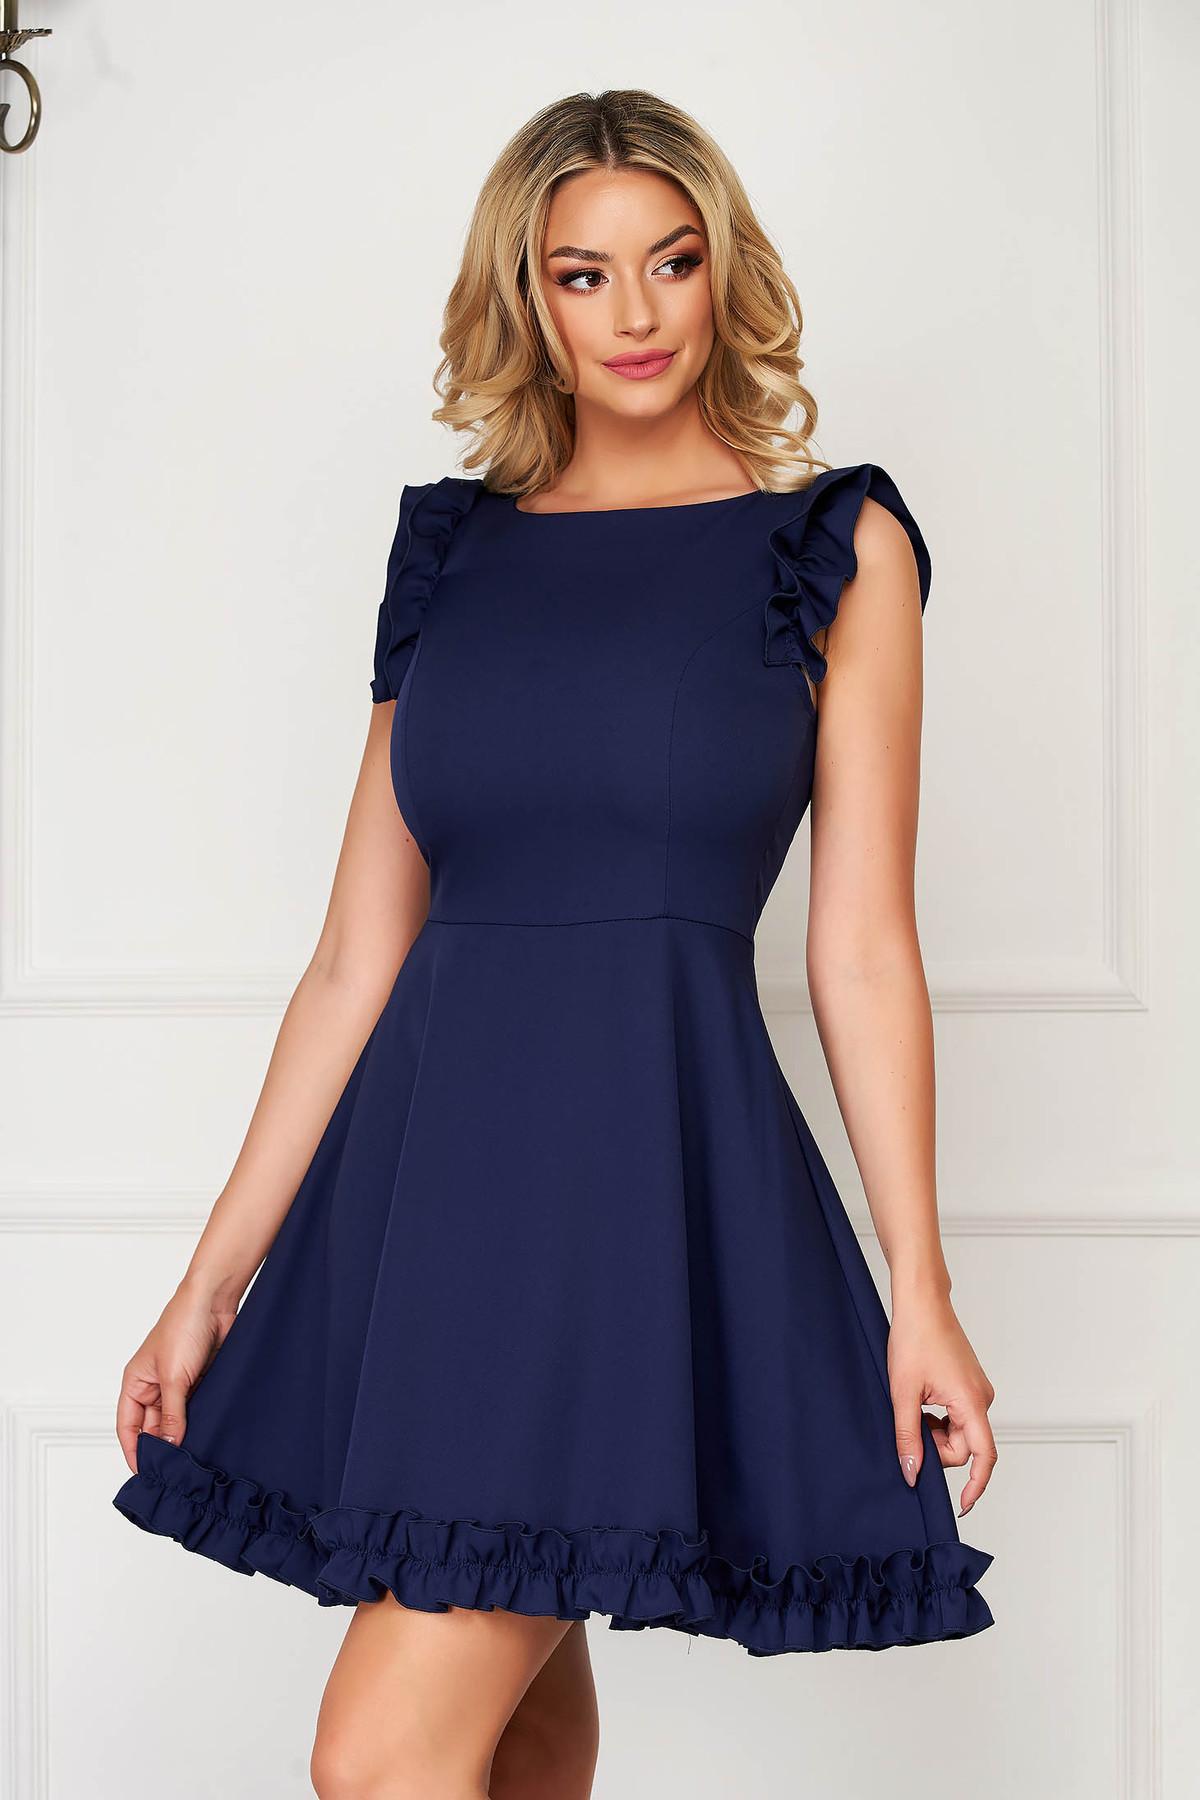 Rochie albastru-inchis eleganta scurta din stofa cu volanase la maneca